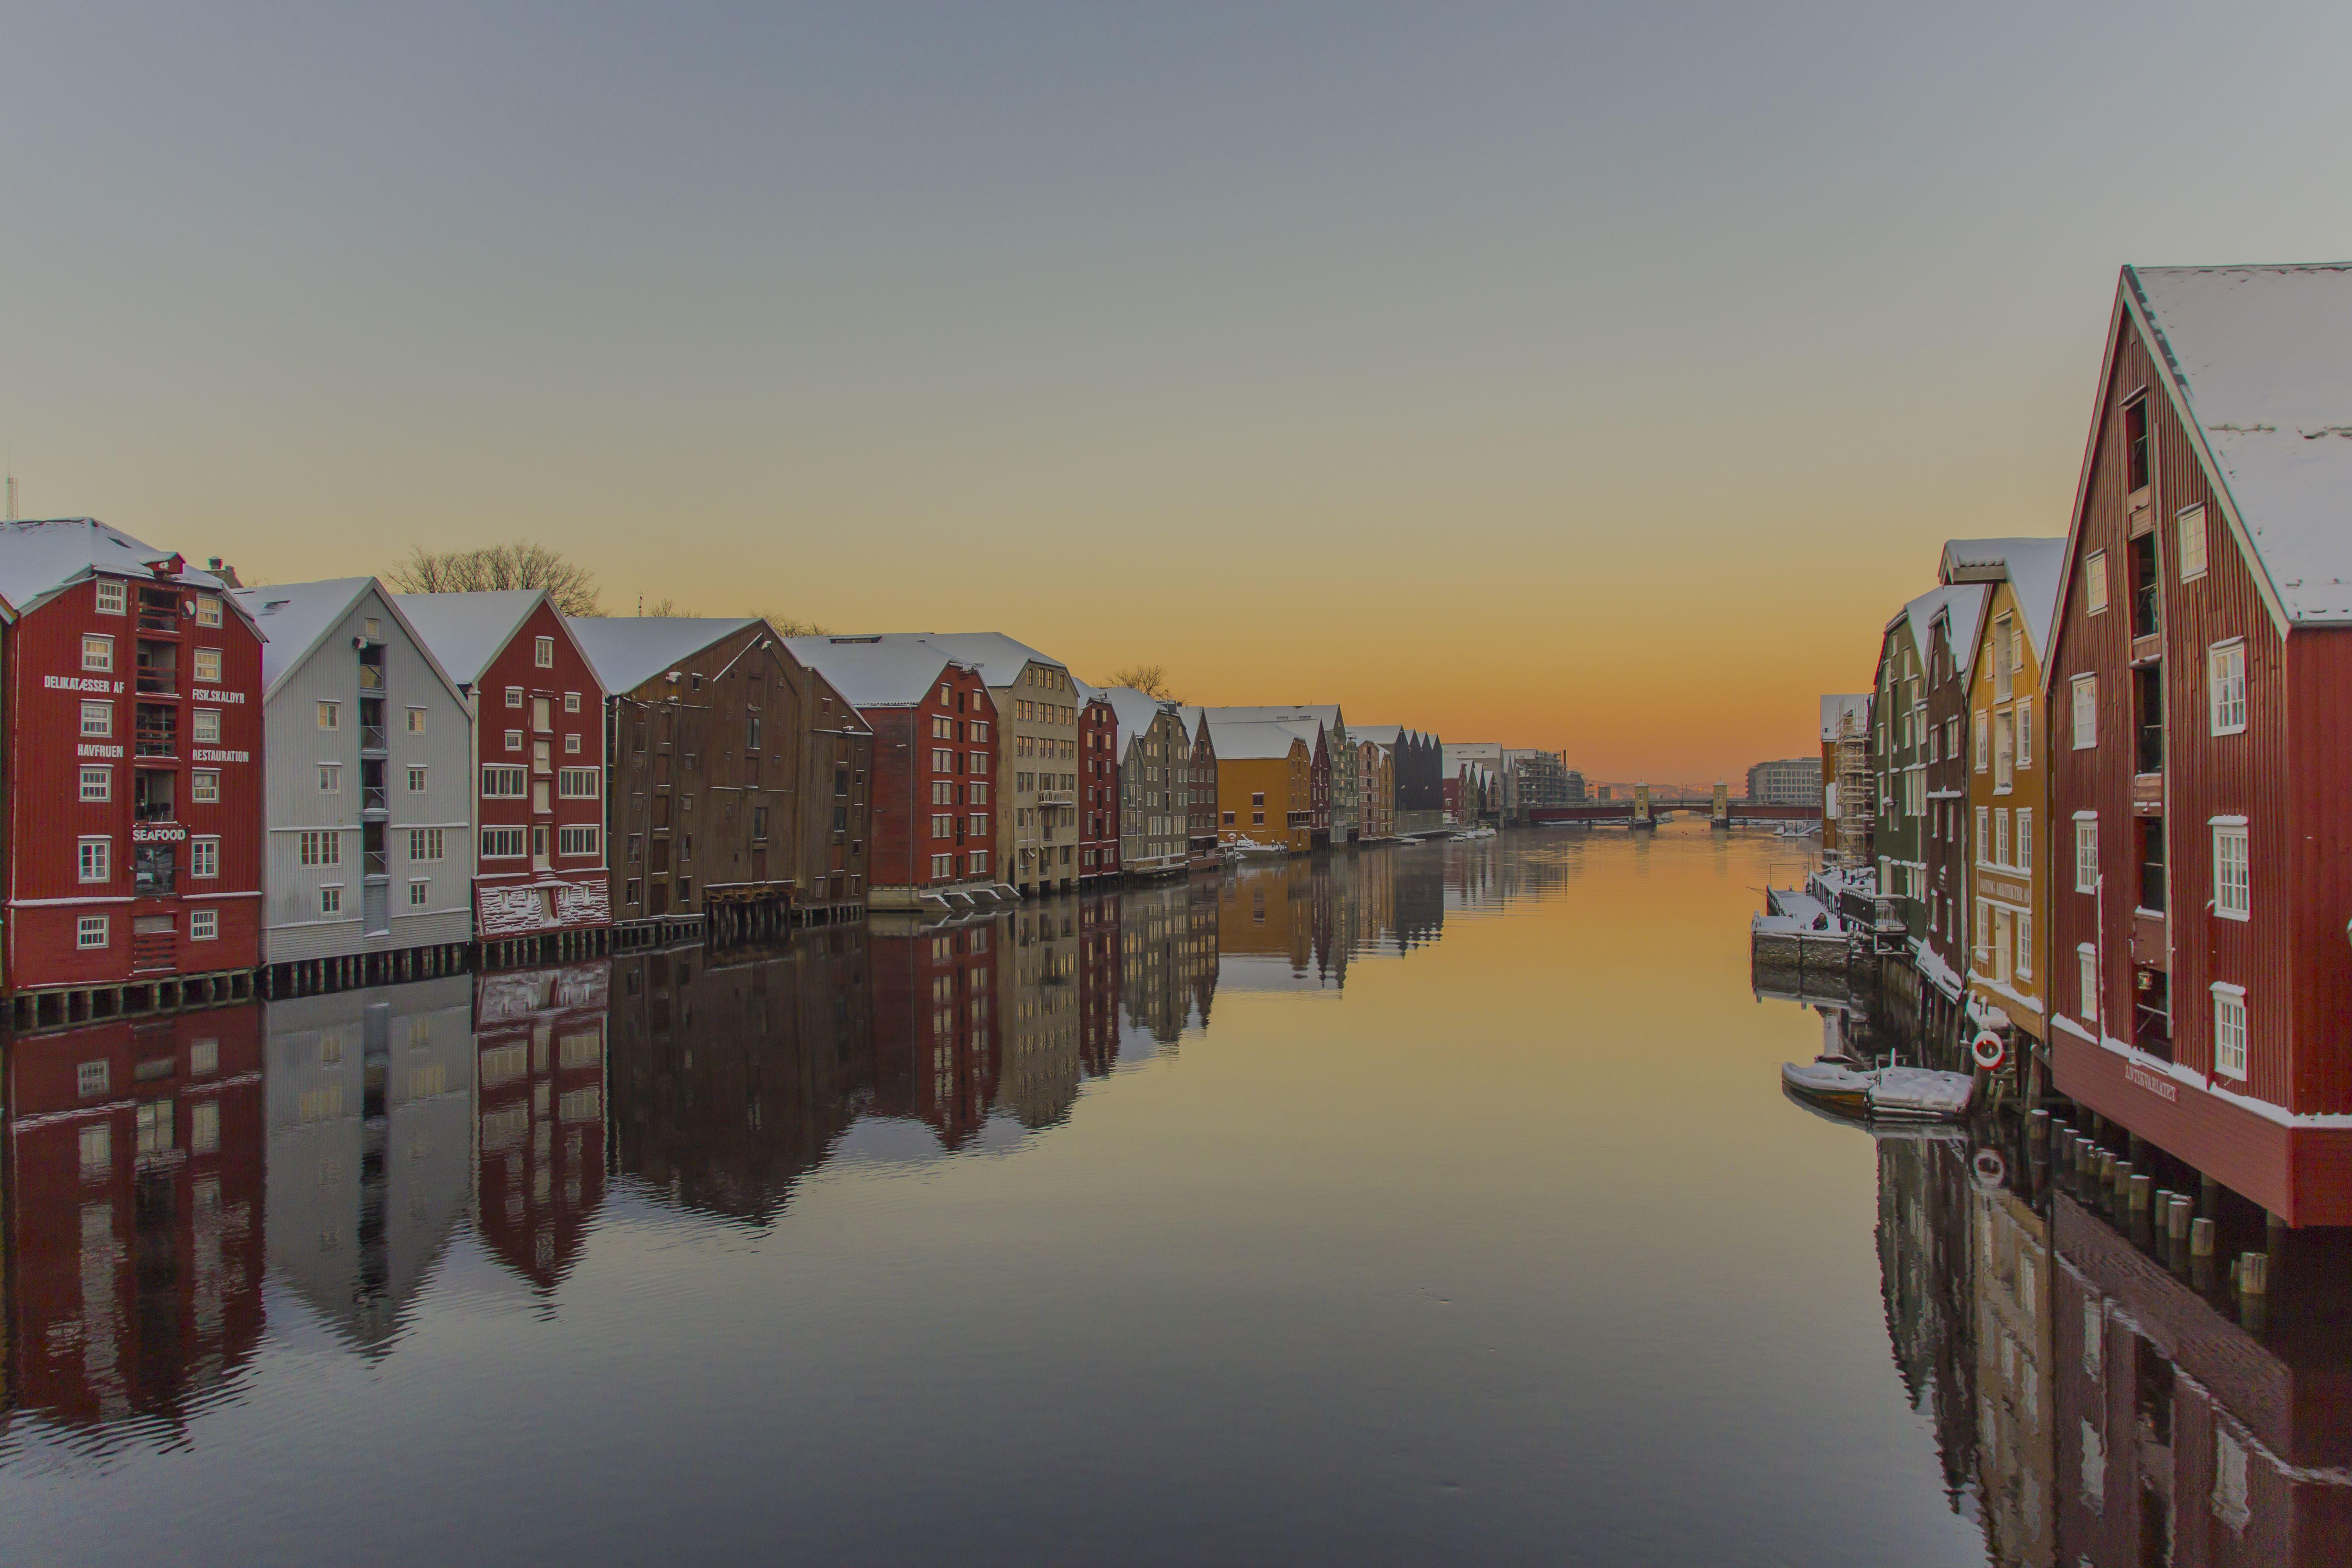 Trondheim along the waterfront by bike